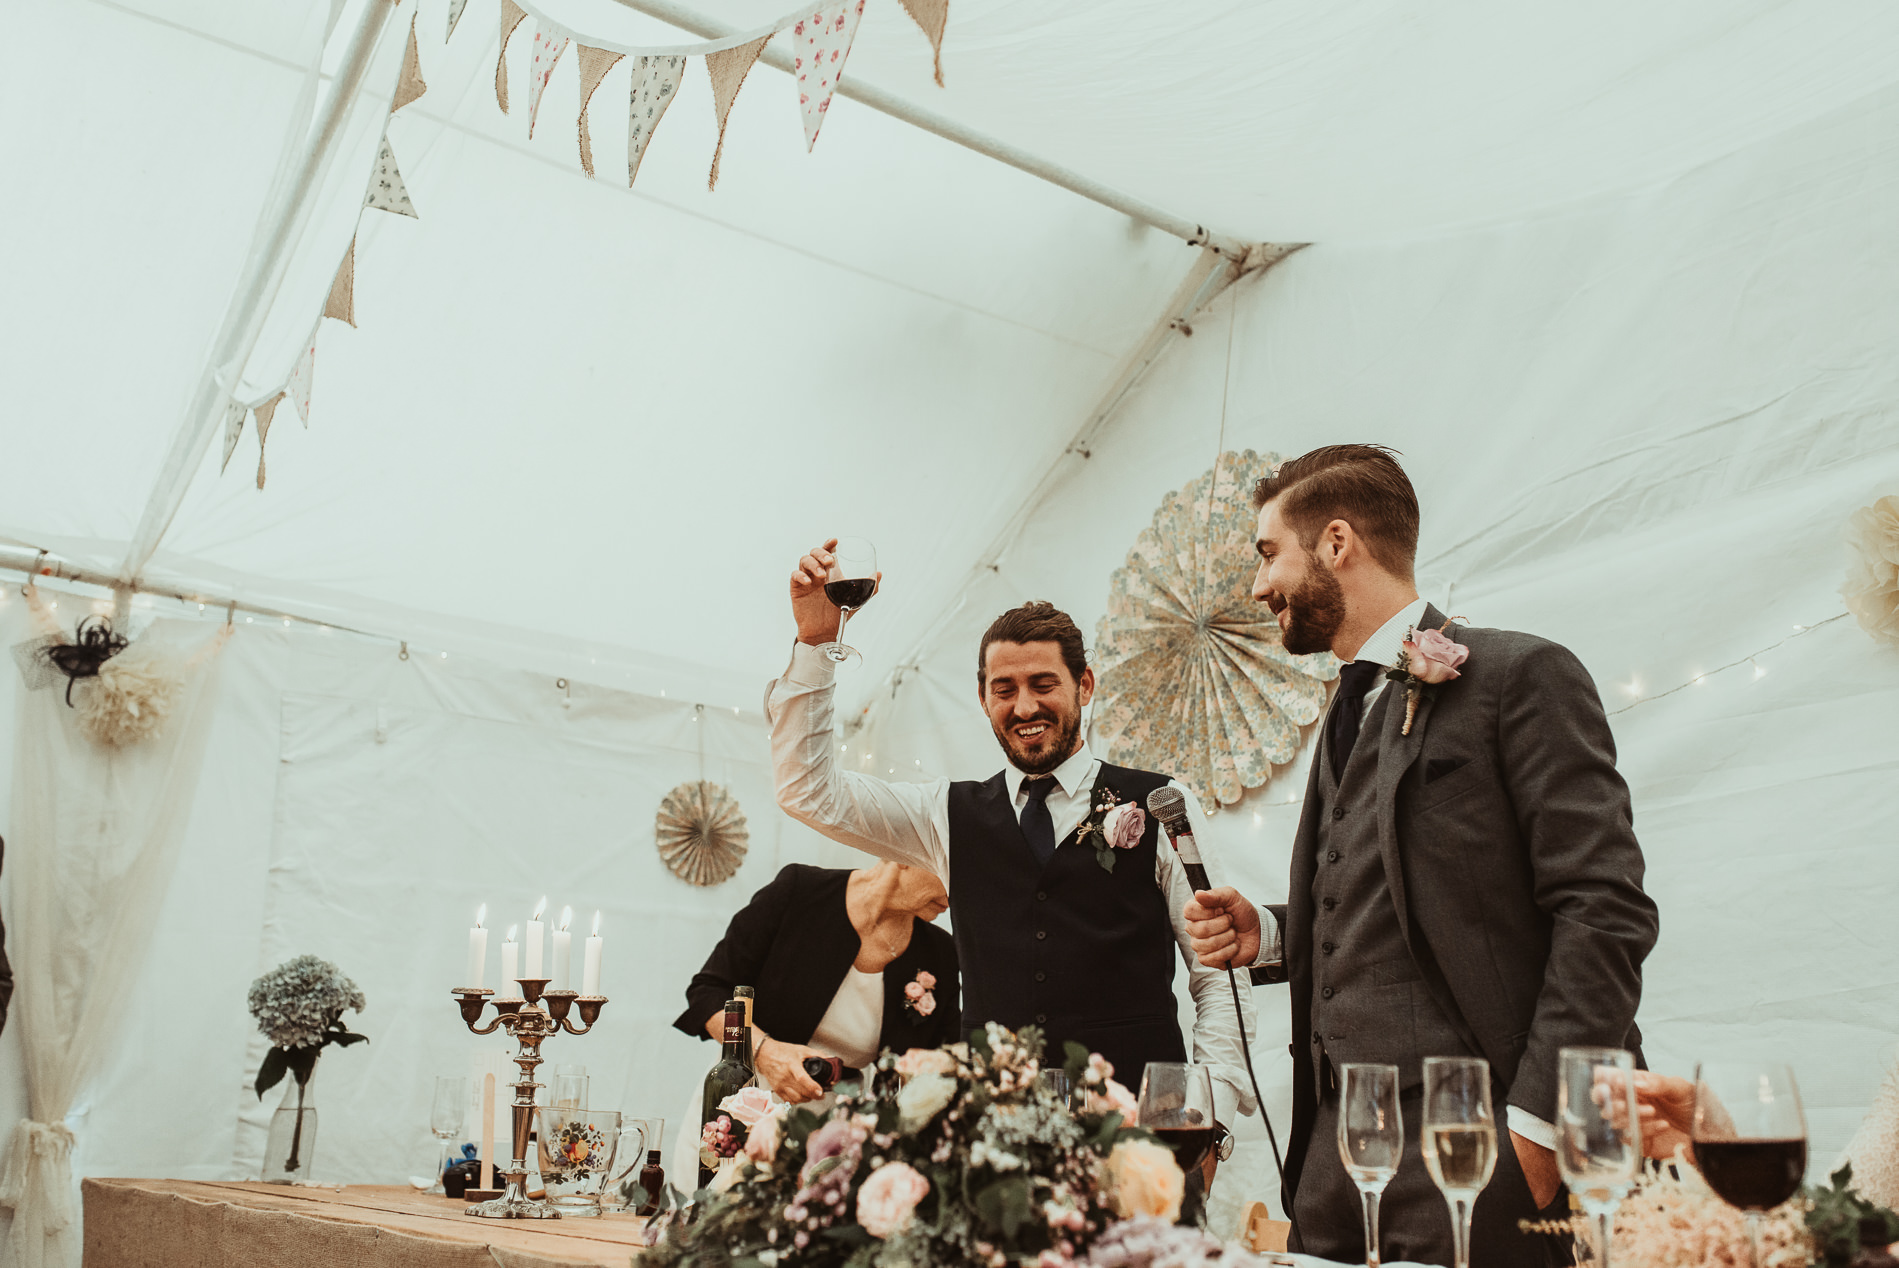 bohemian_wedding_lawshall_church_garden118